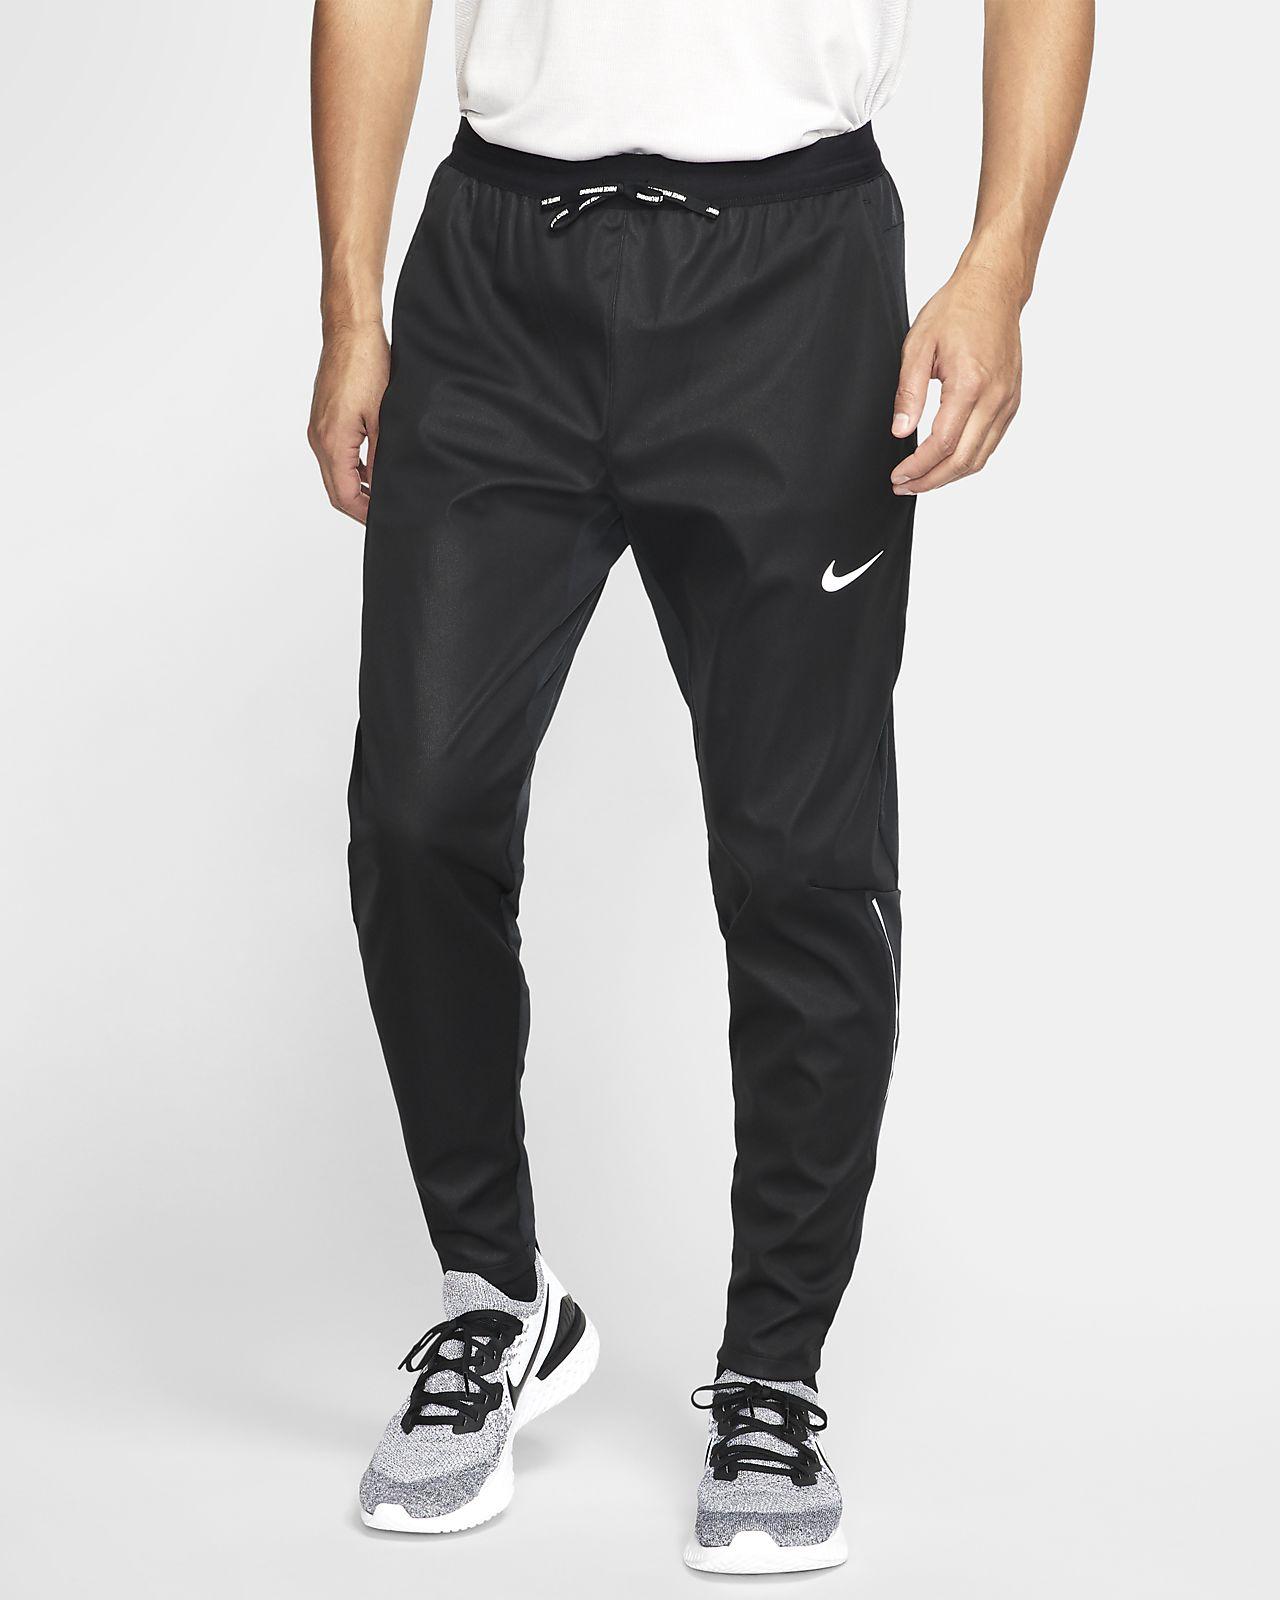 Мужские беговые брюки Nike Shield Phenom